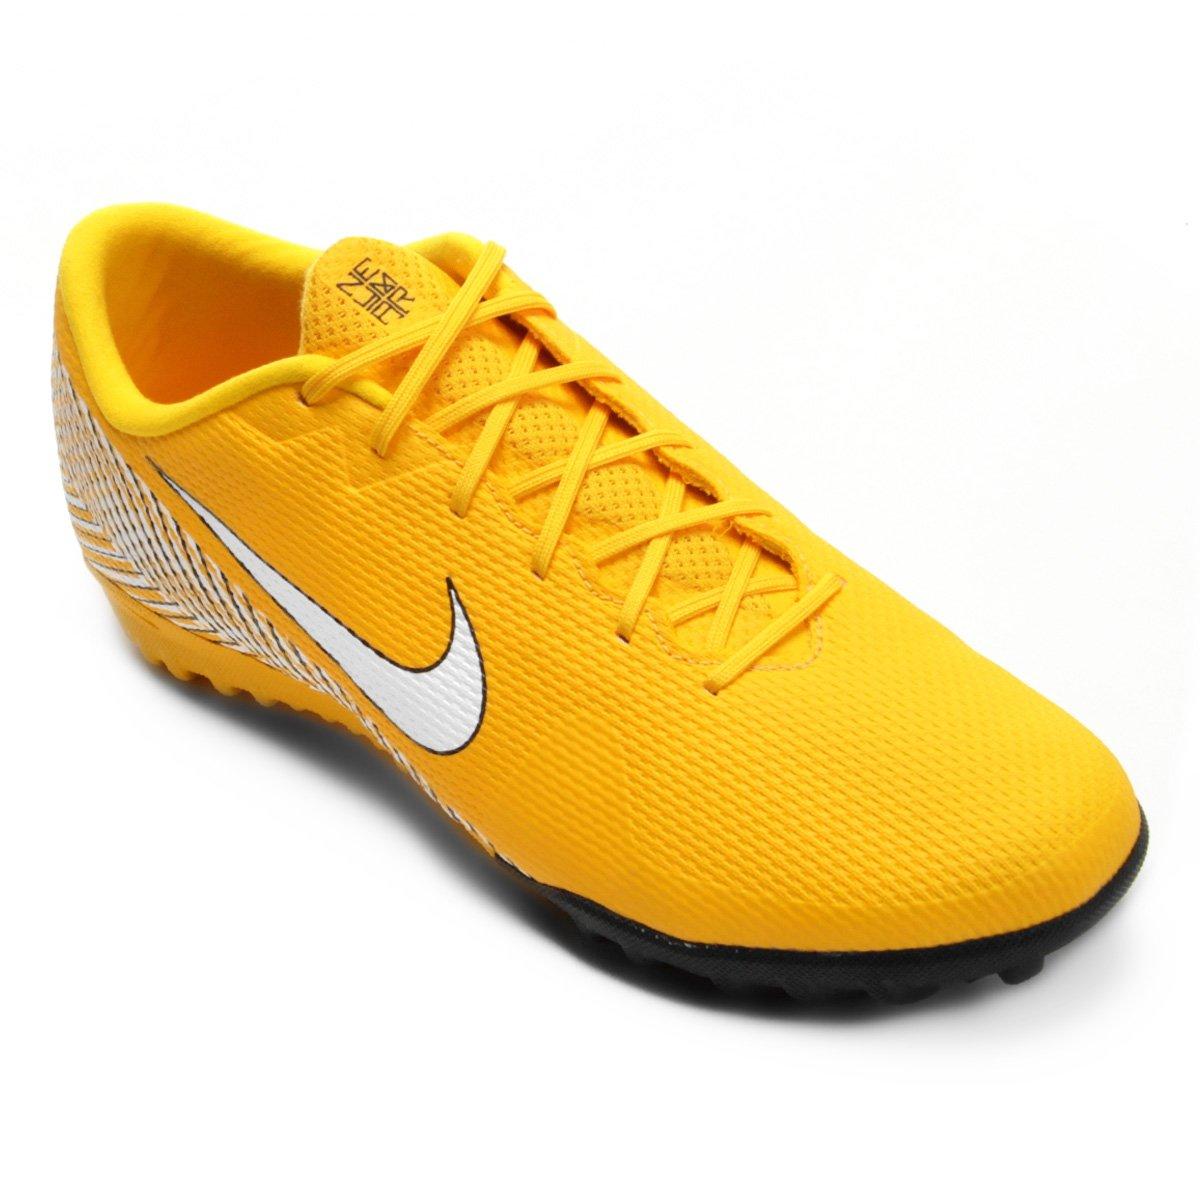 c8dae04e35 Chuteira Society Nike Mercurial Vapor 12 Academy Neymar TF Masculina .